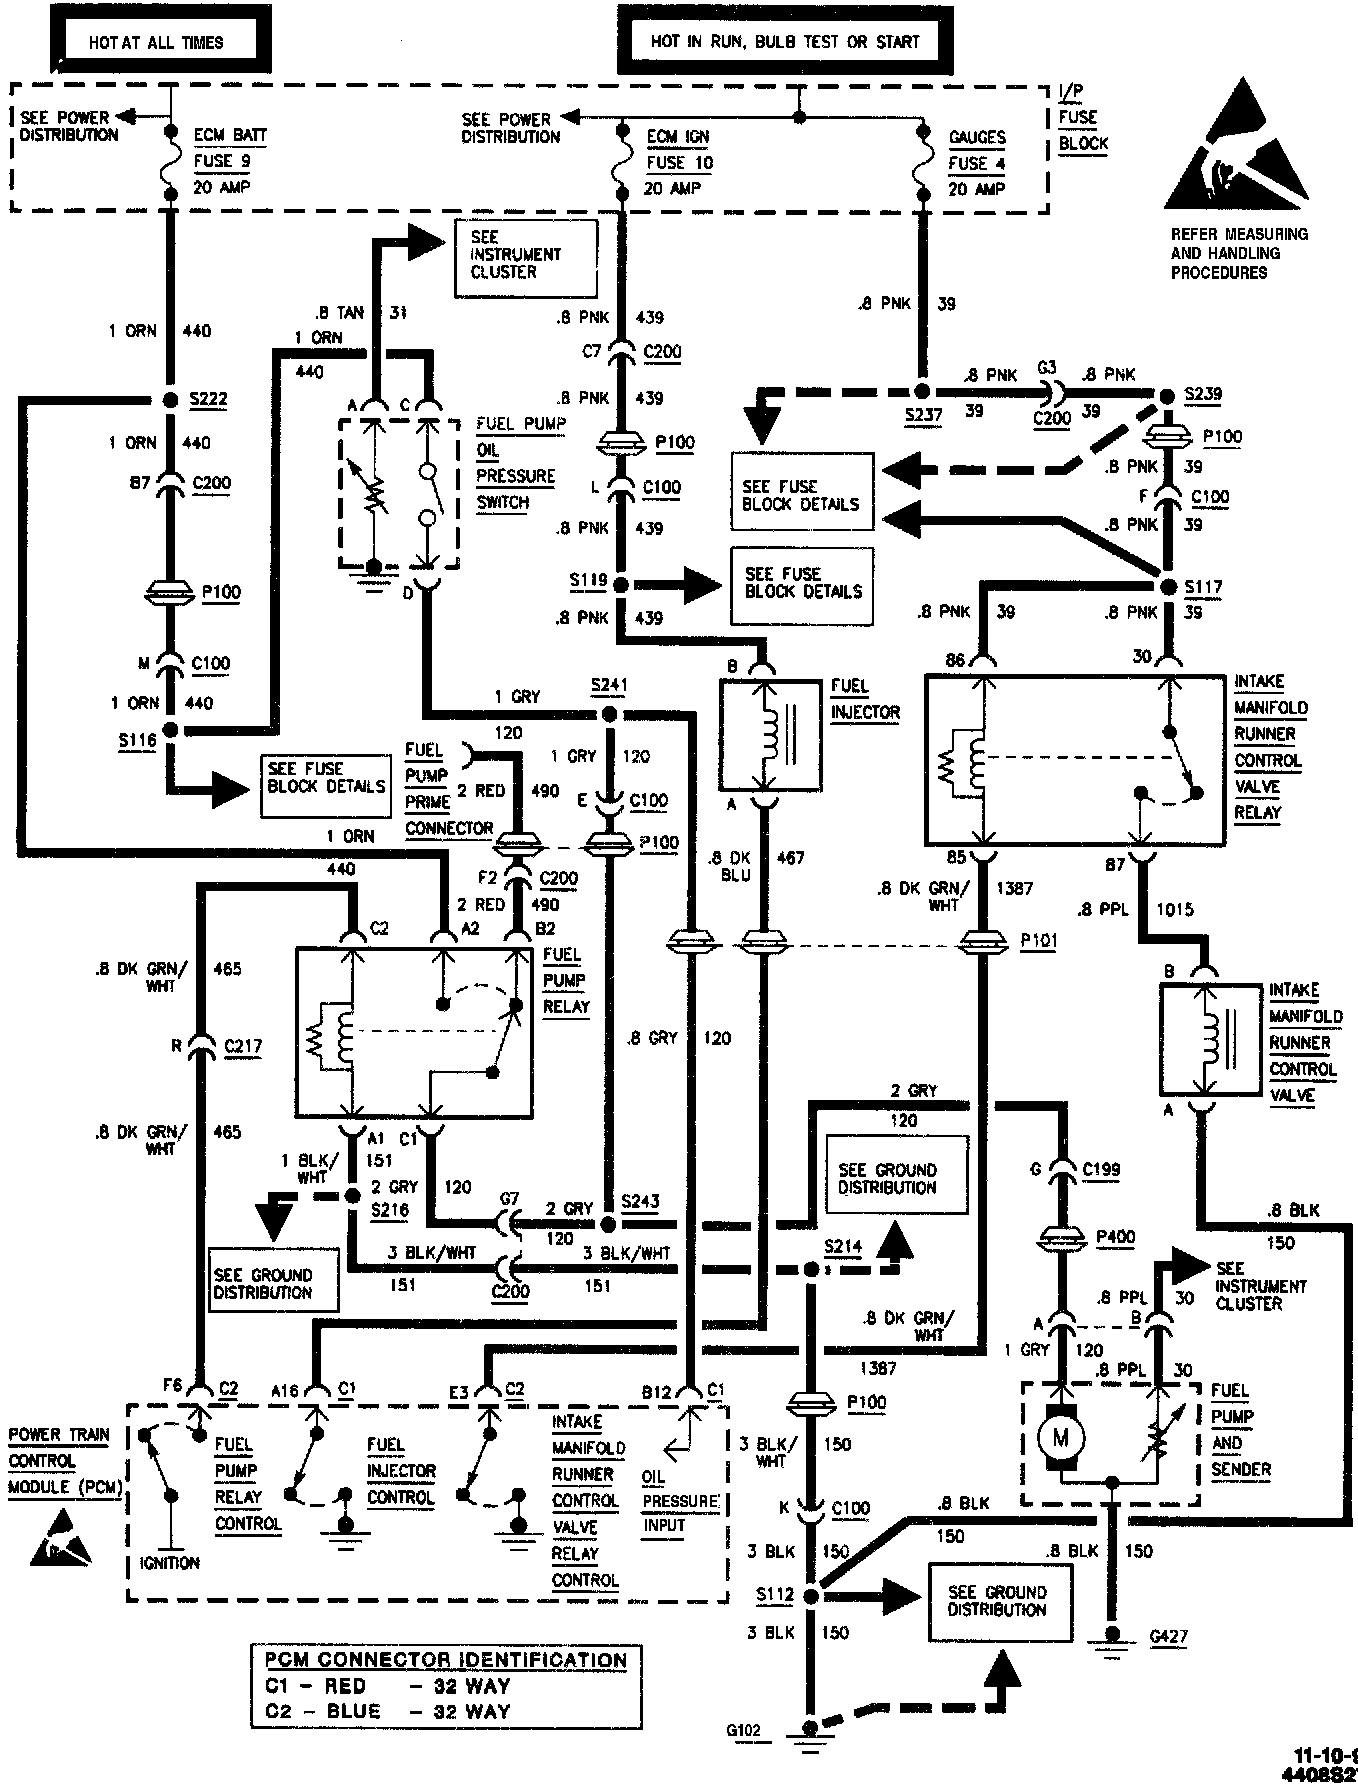 hight resolution of 1992 chevy 350 tbi vacuum diagram chevrolet wiring diagrams 1995 chevy silverado wiring diagram 1995 chevy